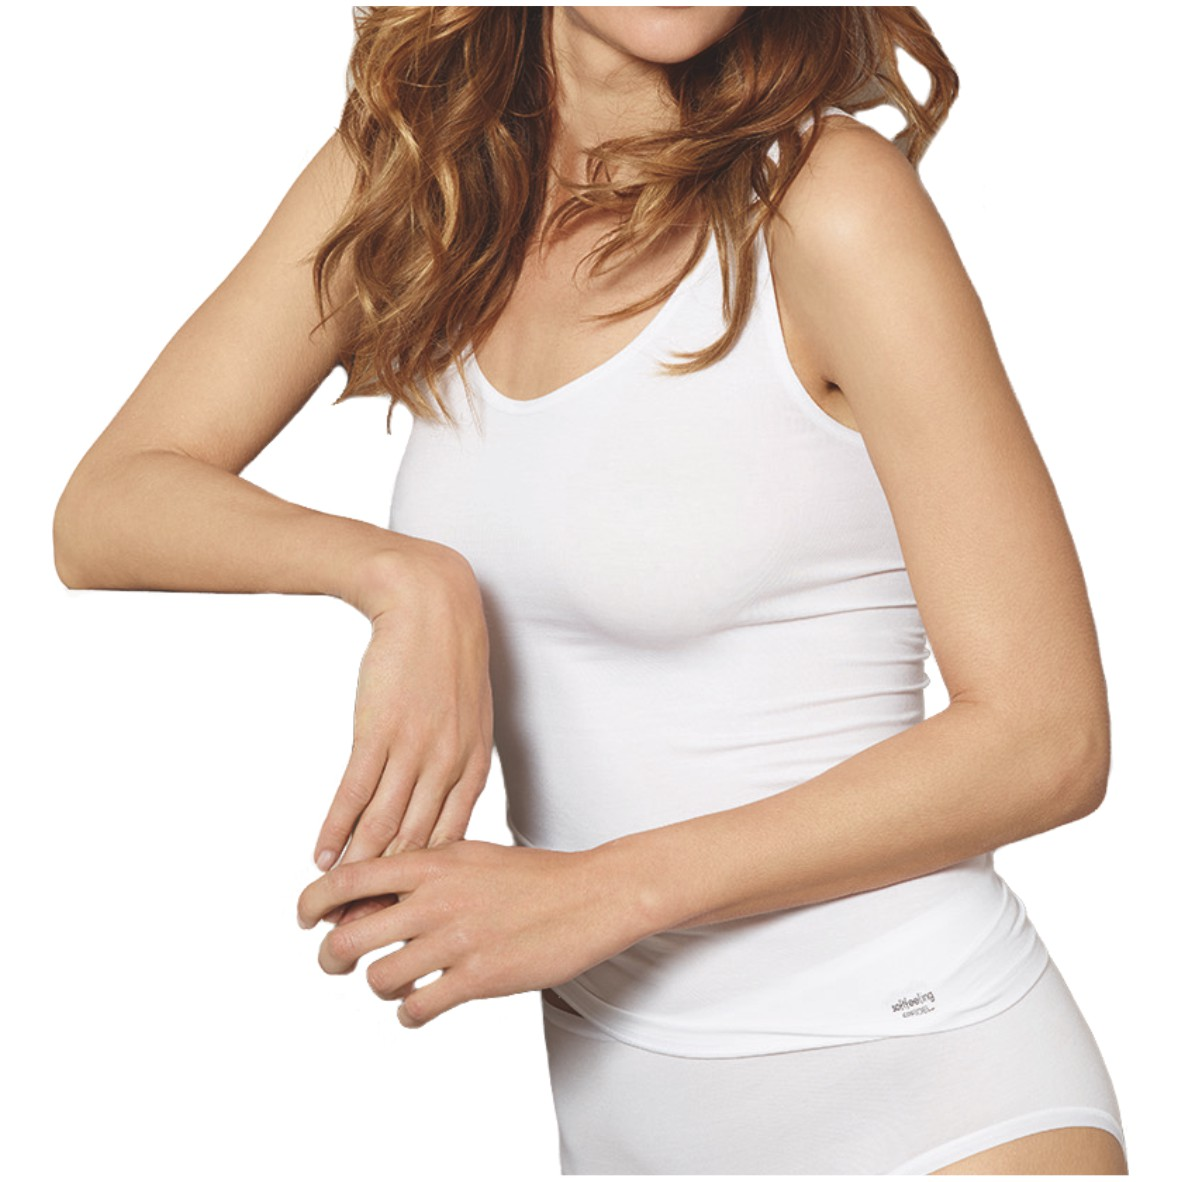 aa085f8195 Speidel Damen Softfeeling Trägerhemd 3er Pack - Siemers Online-Shop